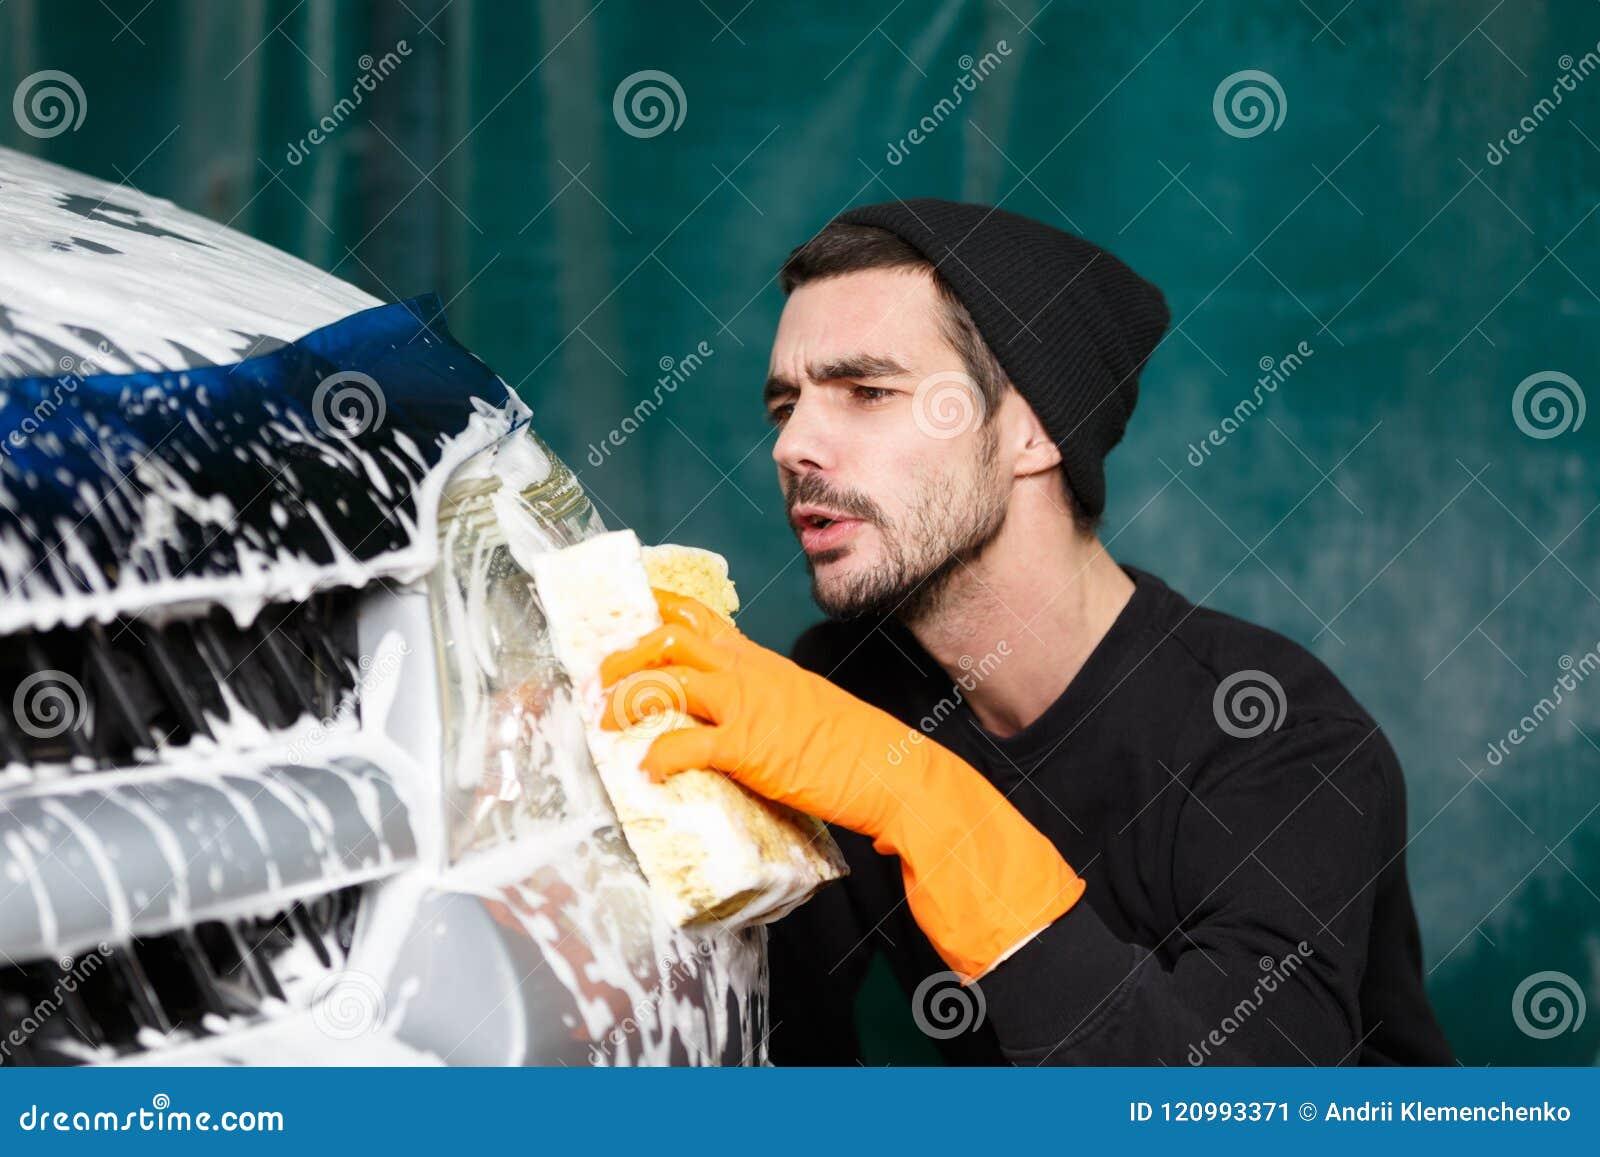 A smiling man washes a grey car